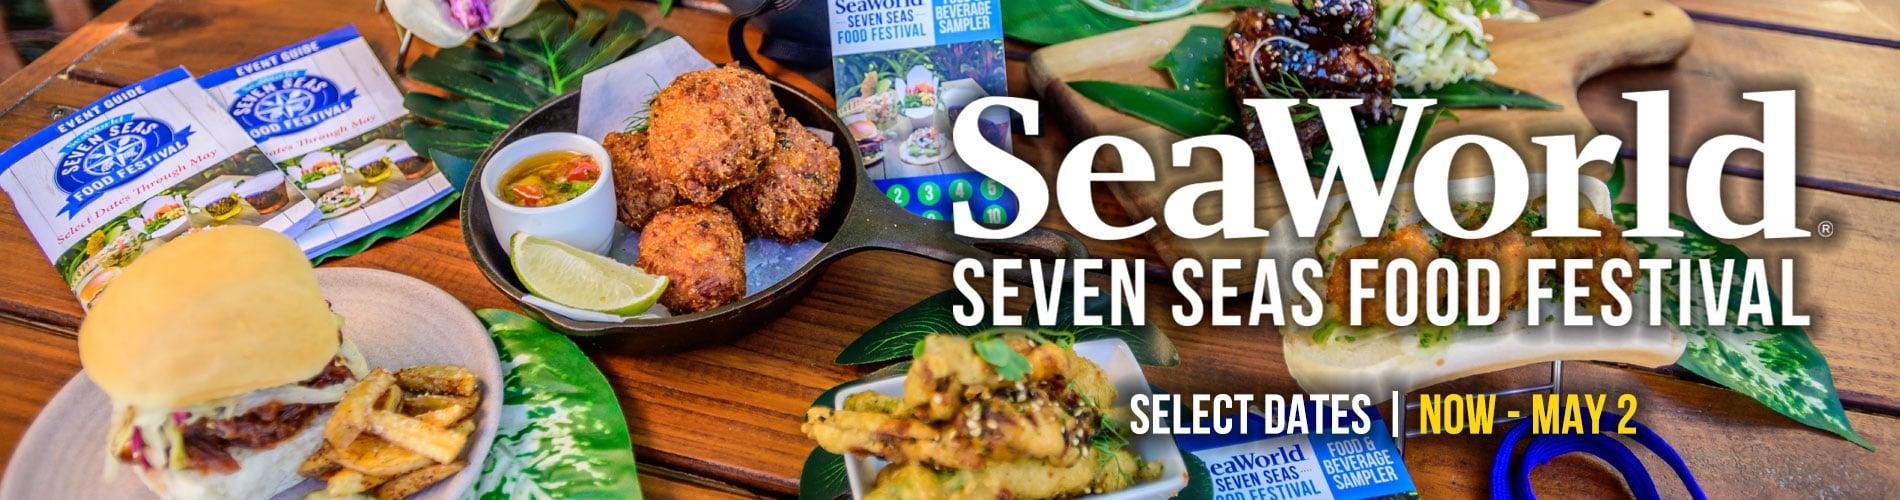 Seven Seas Food Festival at SeaWorld San Diego Now through May 2